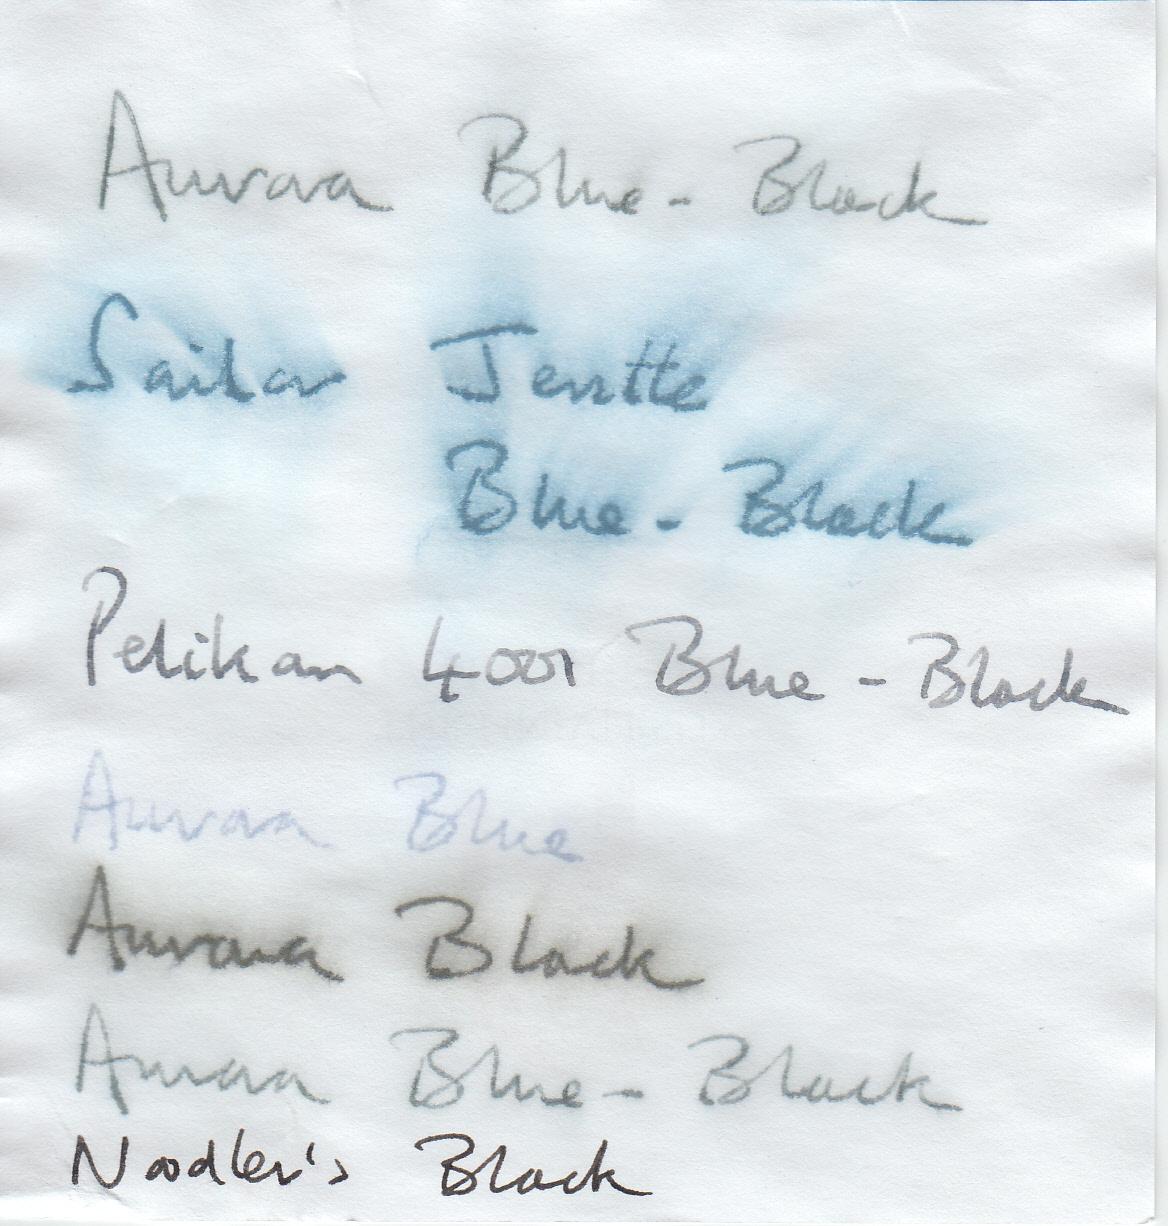 fpn_1490005001__aurora_blue-black_soak_t